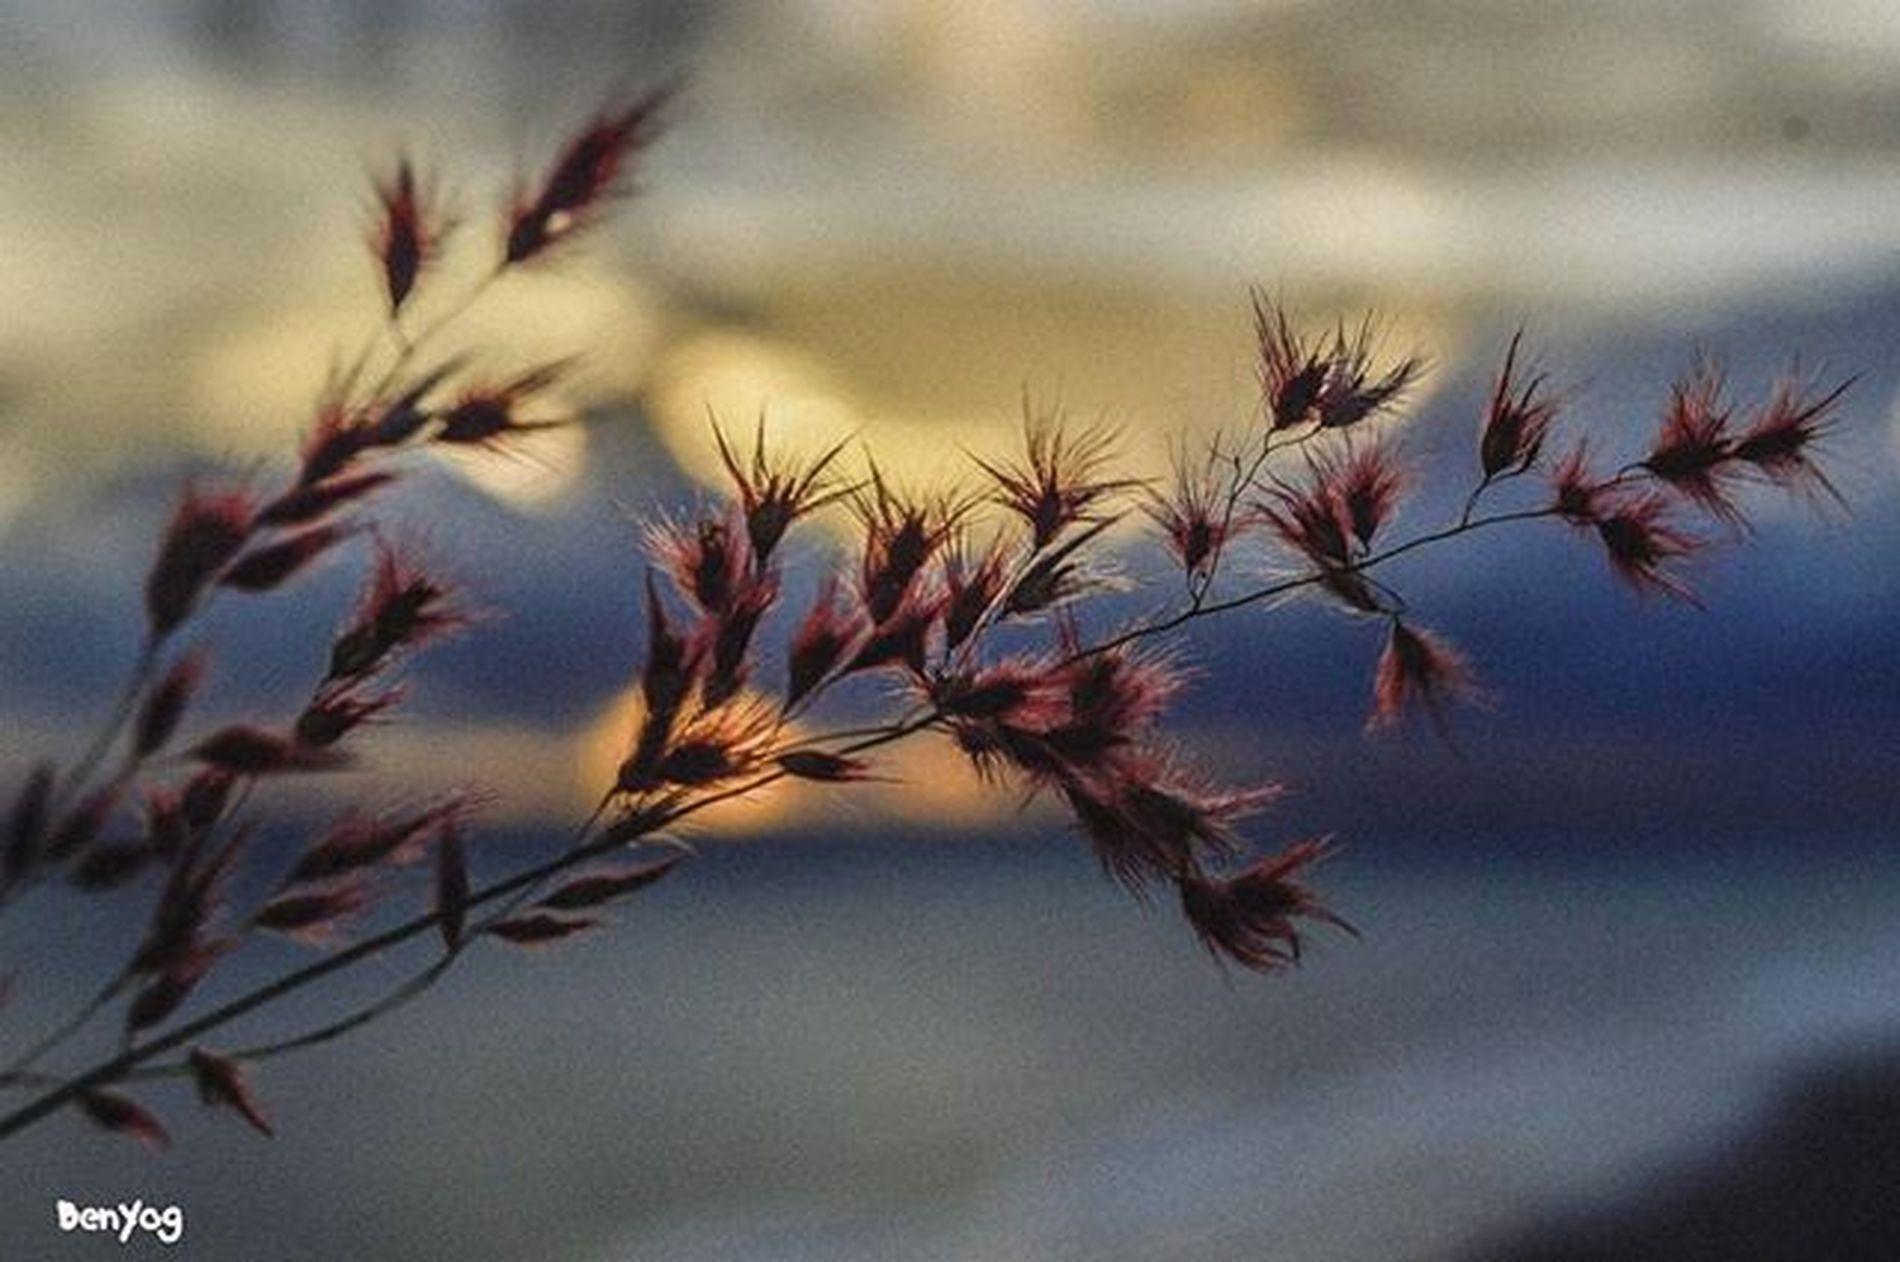 Bunga rumput berlatarkan senja,, Colek @marlinbrekele meneh, @rizaramadhana meneh, @pabayita Geblekkp Geblekchallenge02